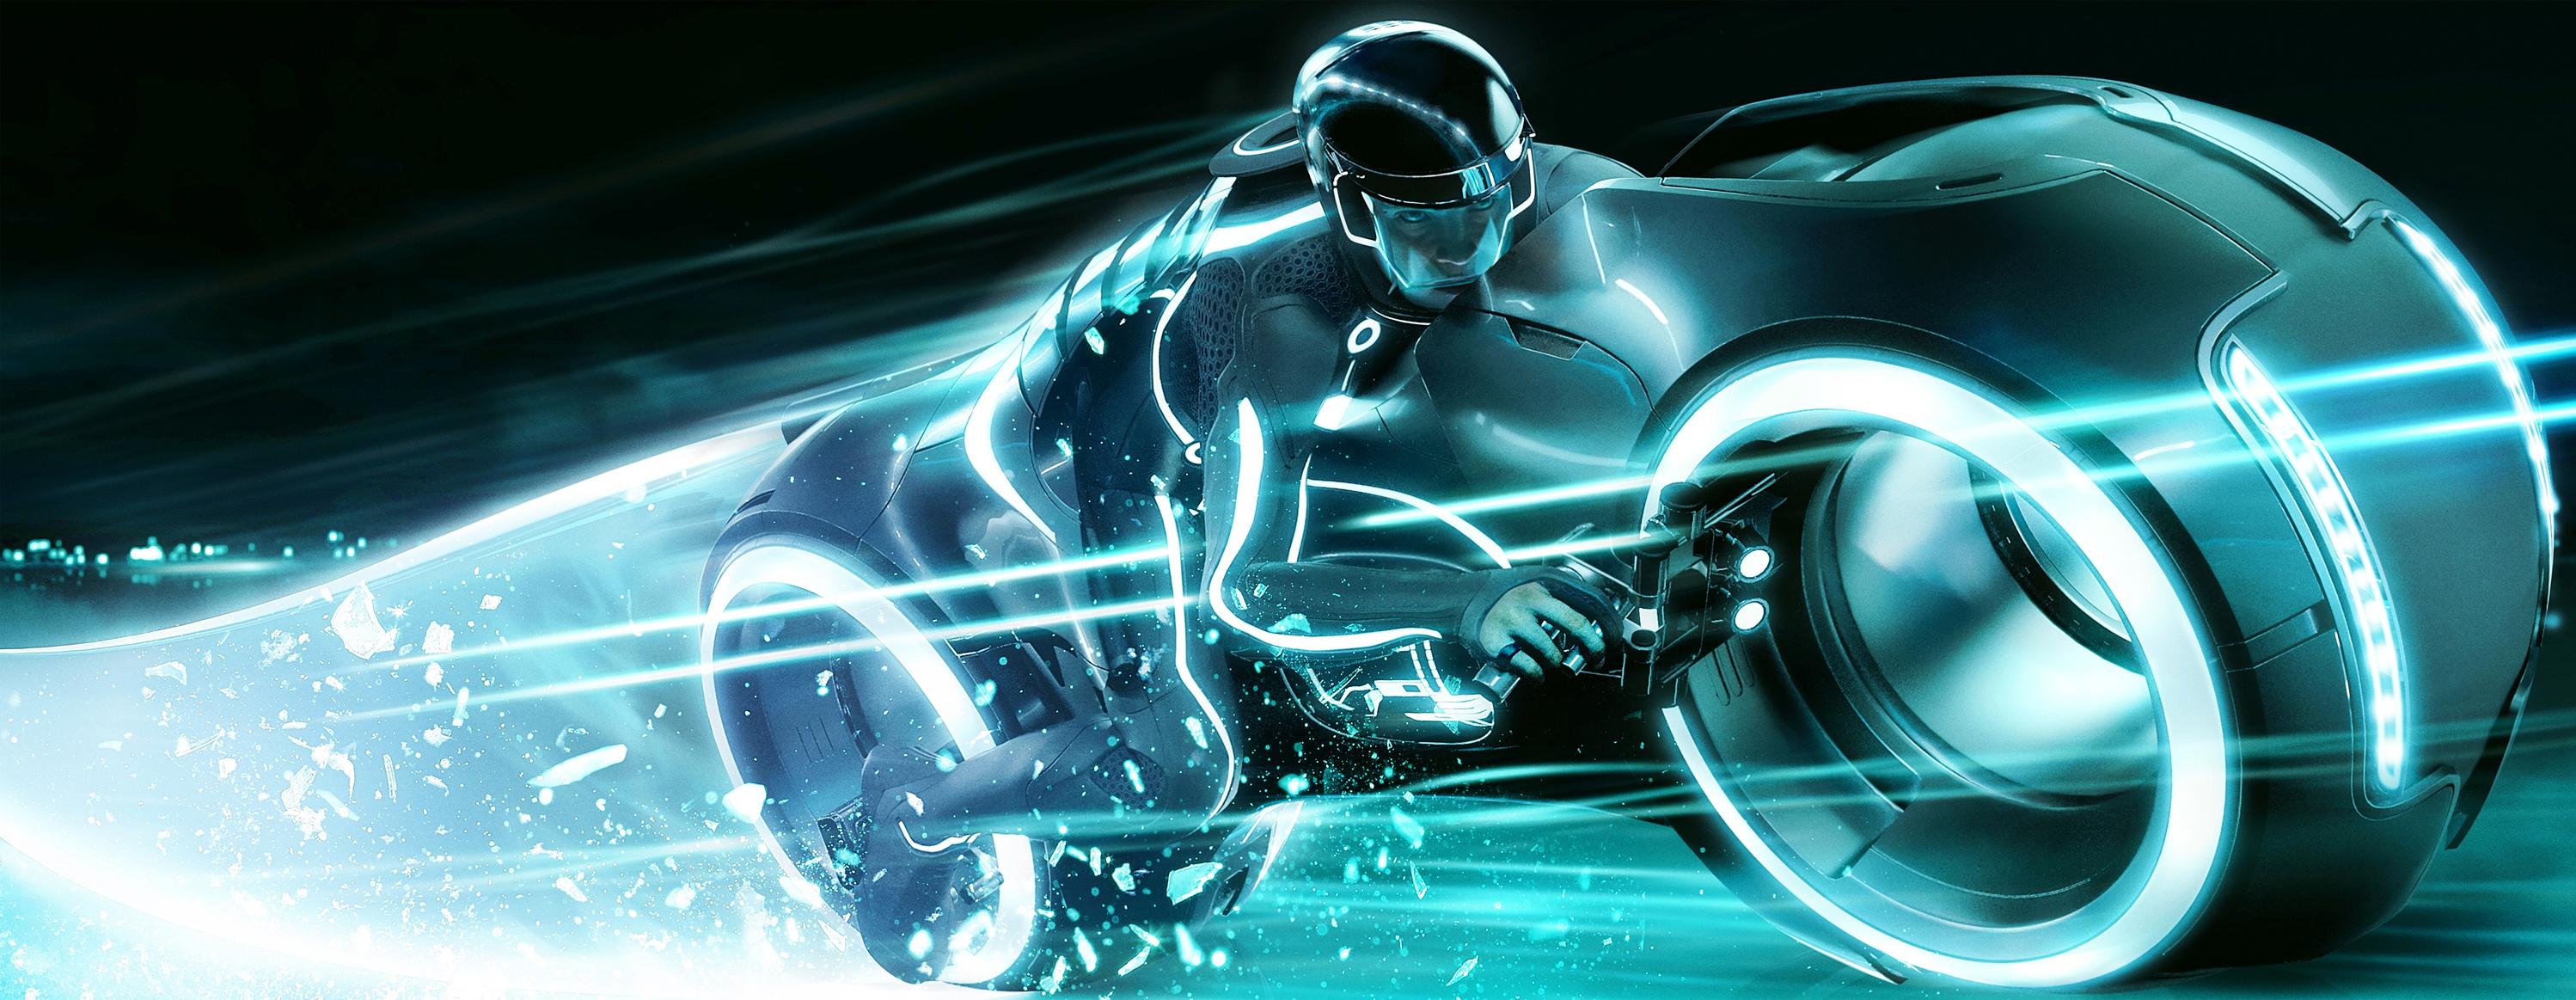 Speeding Light Cycle From Tron: Legacy Desktop Wallpaper